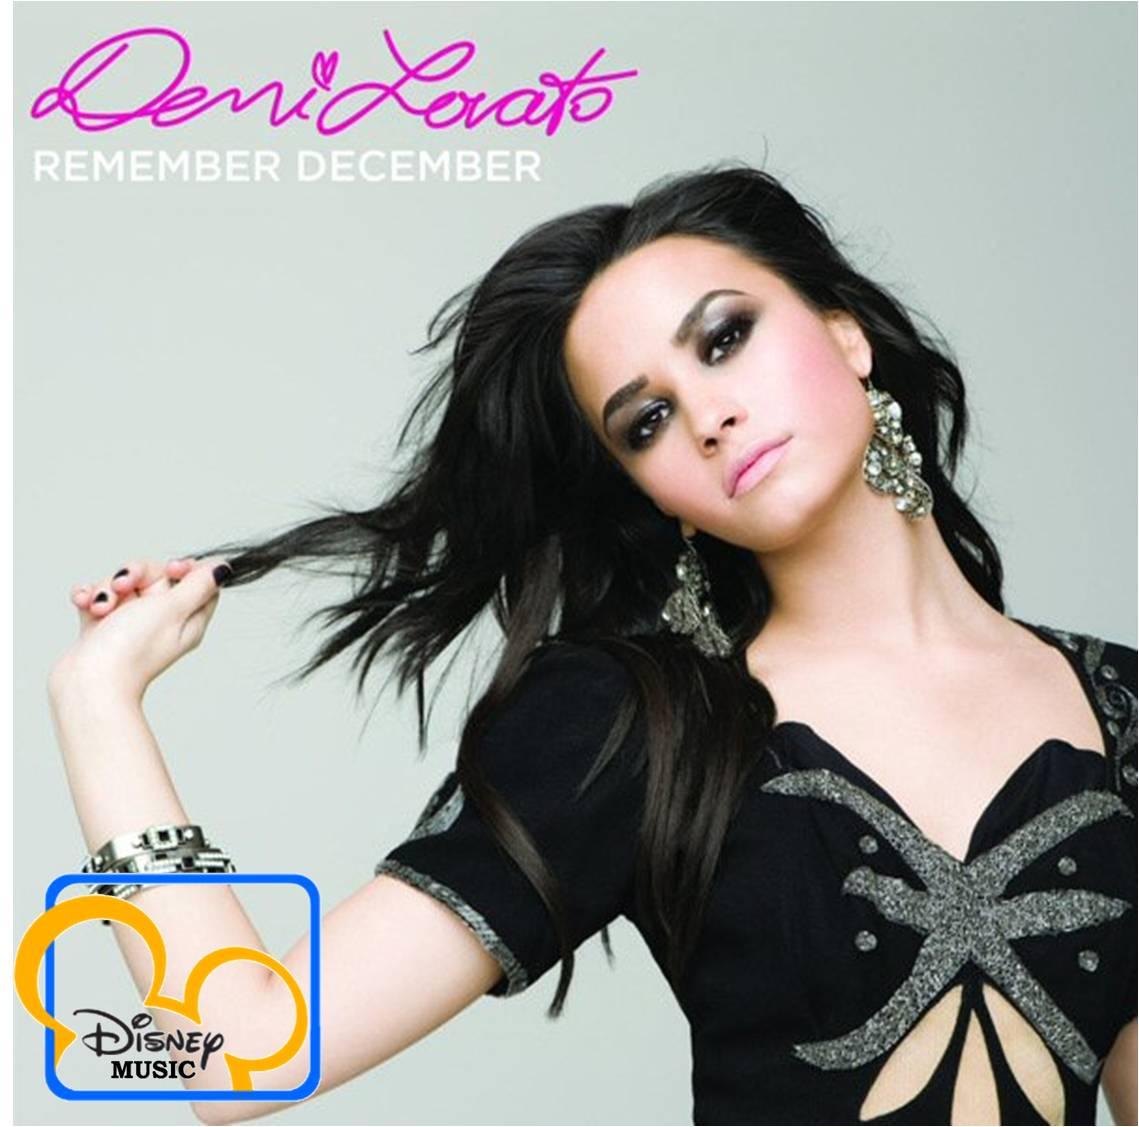 http://2.bp.blogspot.com/_F3q2IOChHpE/TGAa3798bII/AAAAAAAAAEg/CdY5ryRjt0g/s1600/Demi-Lovato-Remember-December_uk.jpg